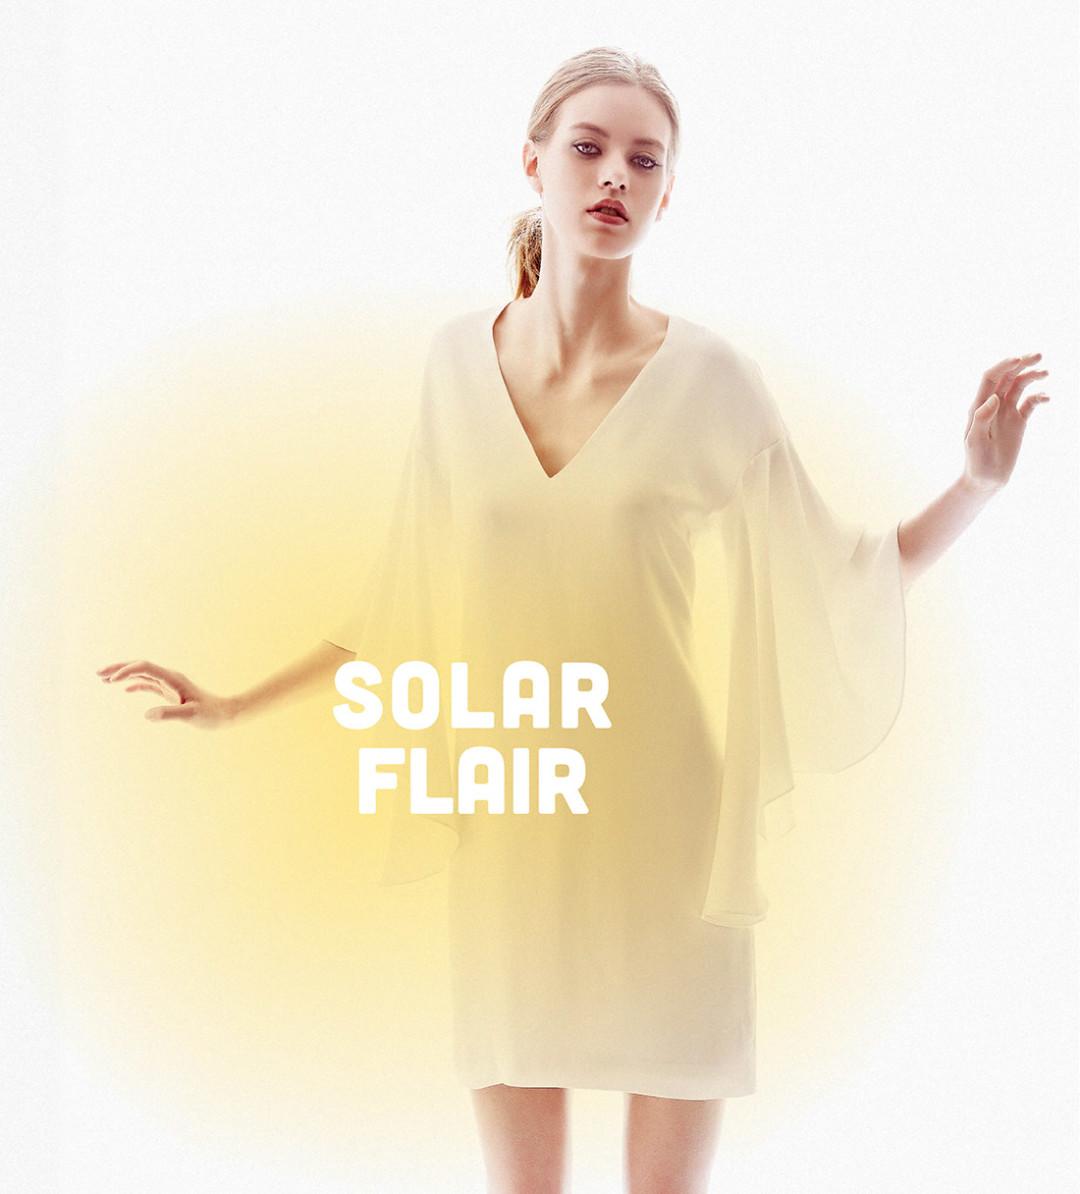 0514 solar flair main y8ioim